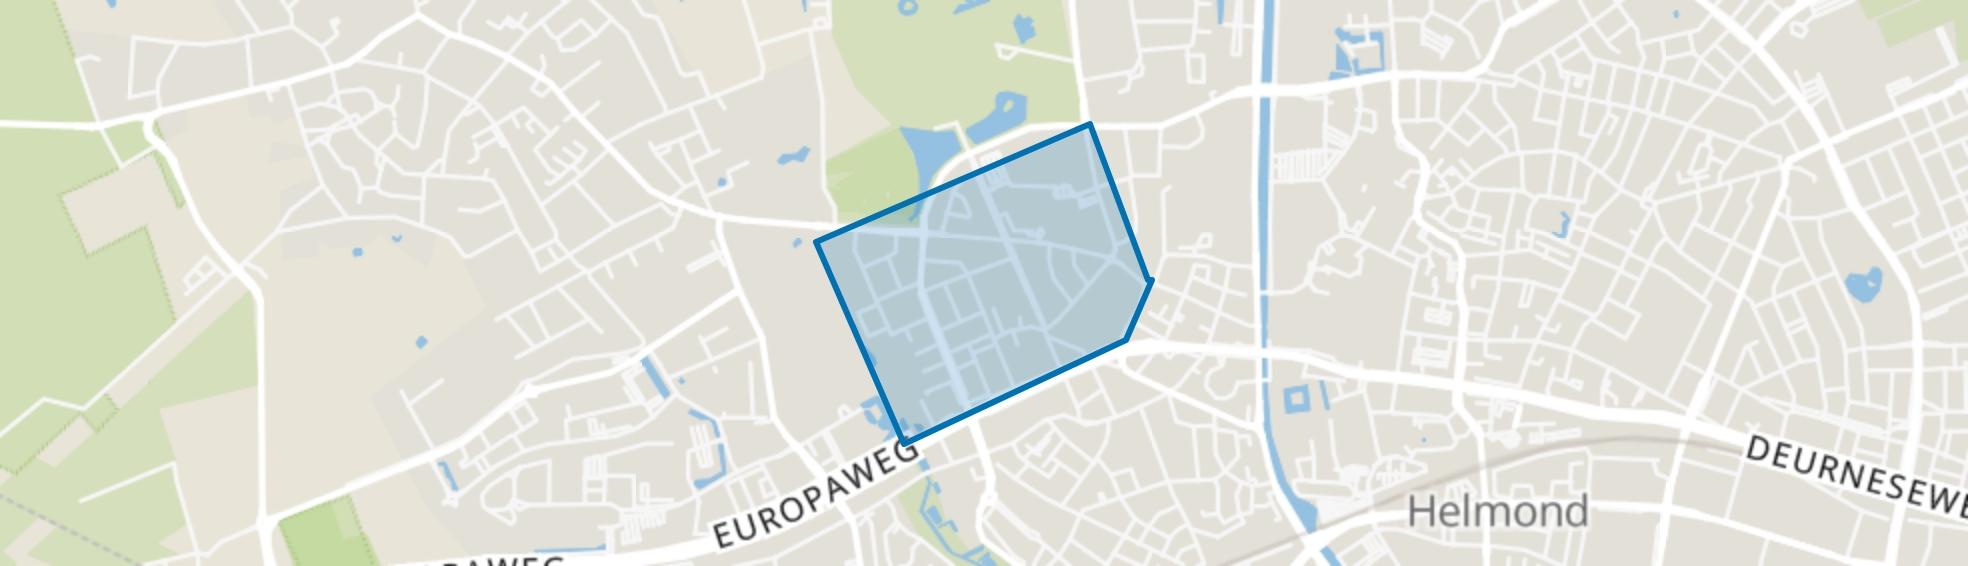 Oranjebuurt, Helmond map